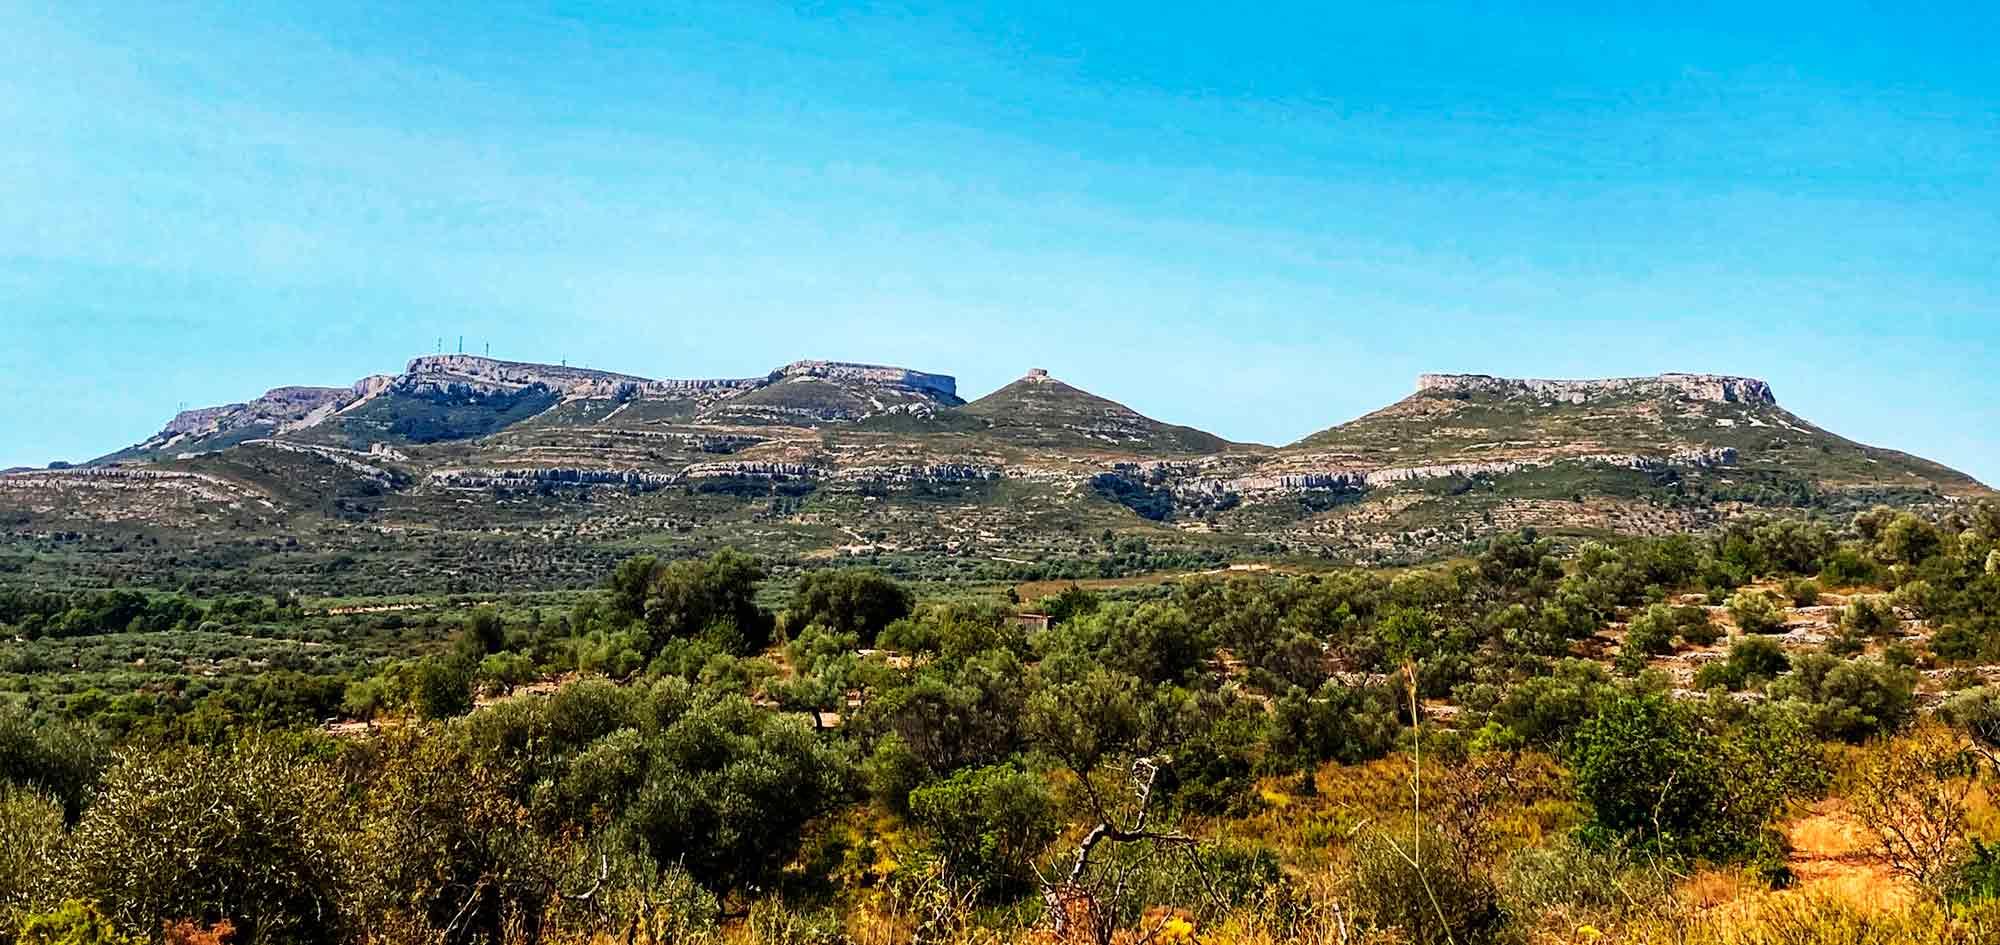 Millennia-old olive trees